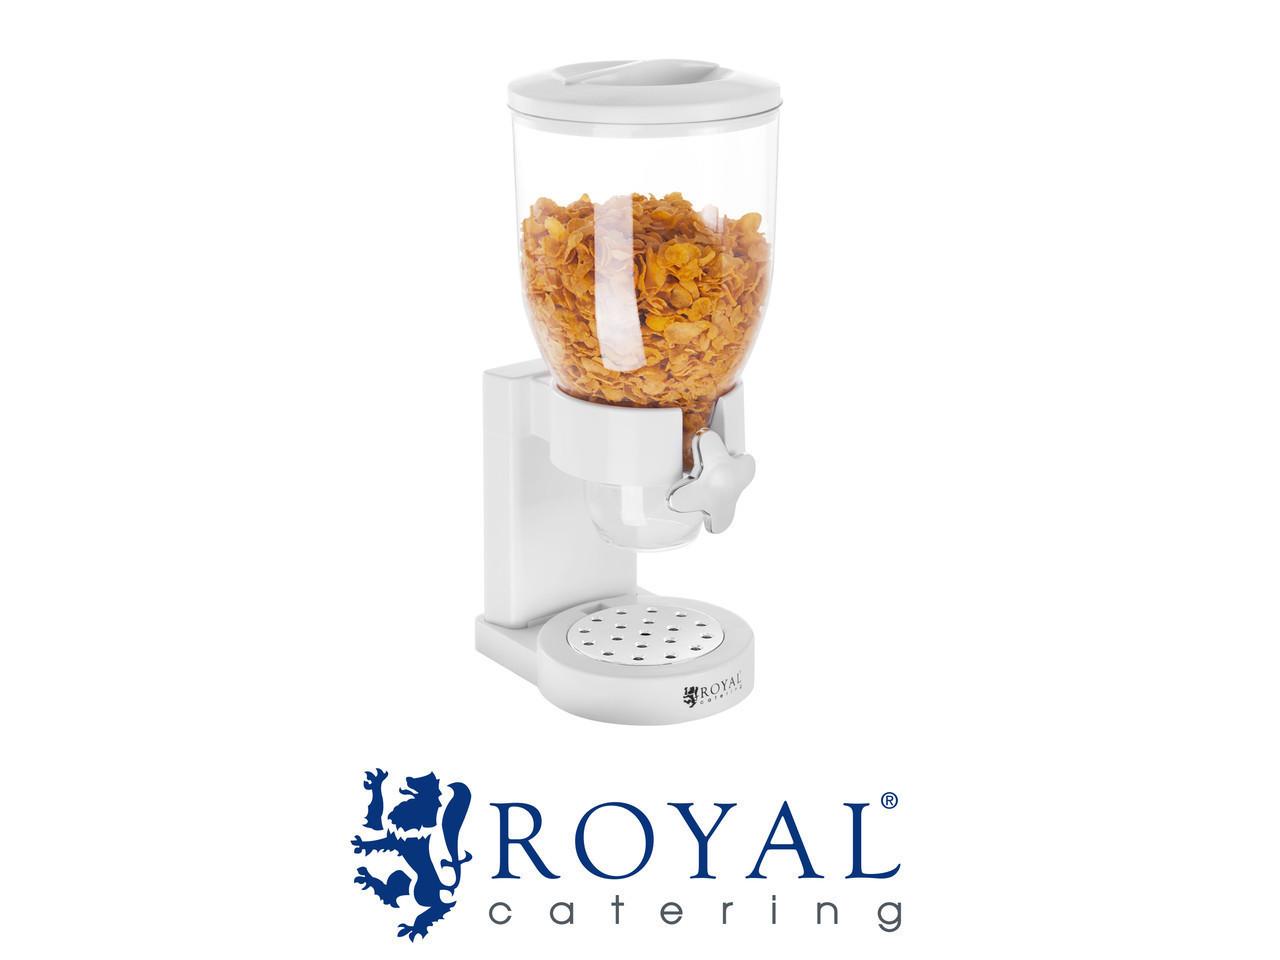 Диспенсер для лепестков 3.5 литра ROYAL